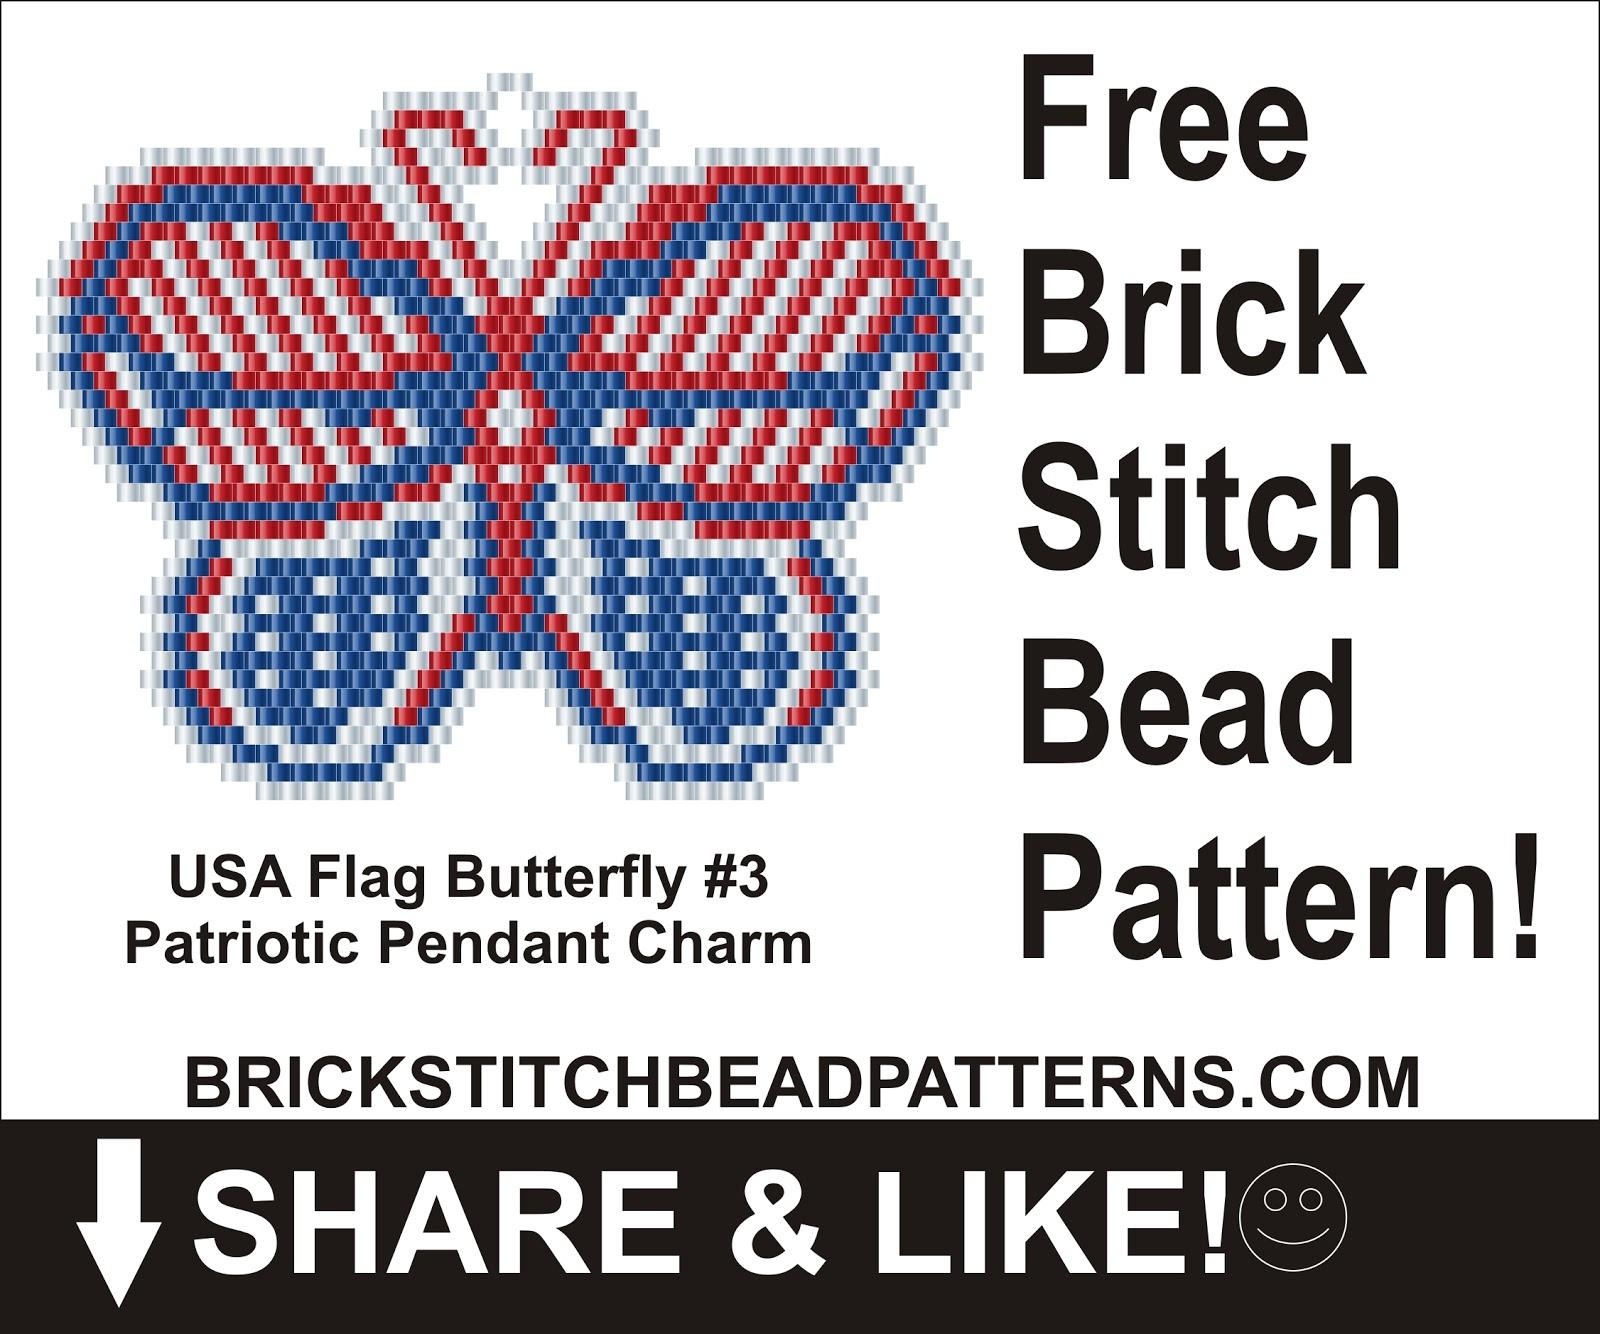 brick stitch bead patterns journal usa flag butterfly 3